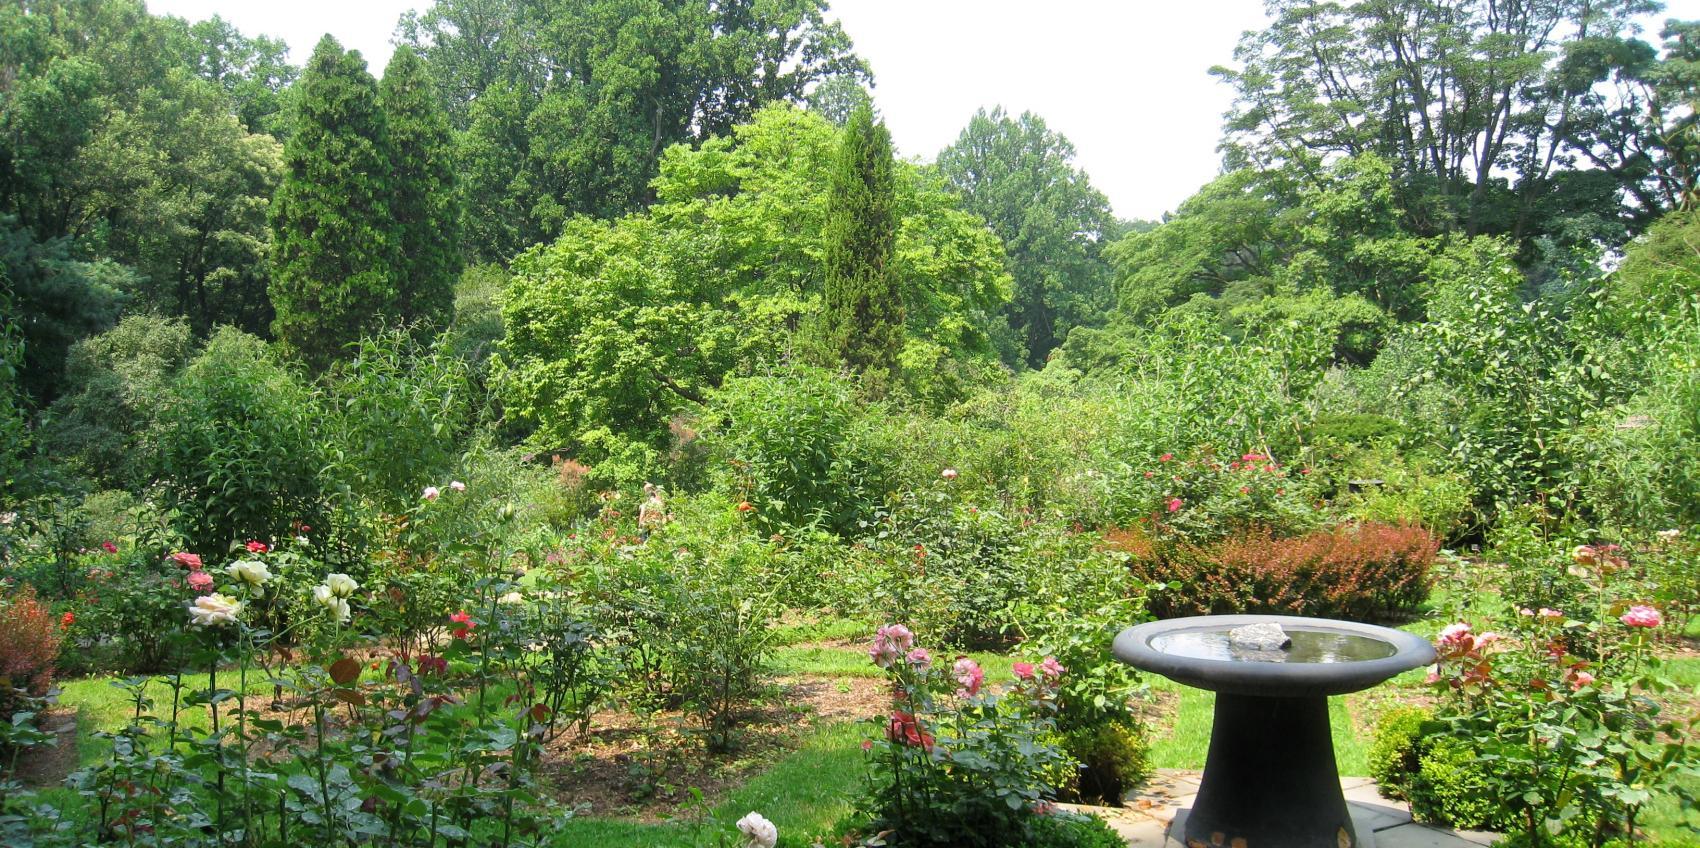 Arboretum Of The Barnes Foundation American Public Gardens Association